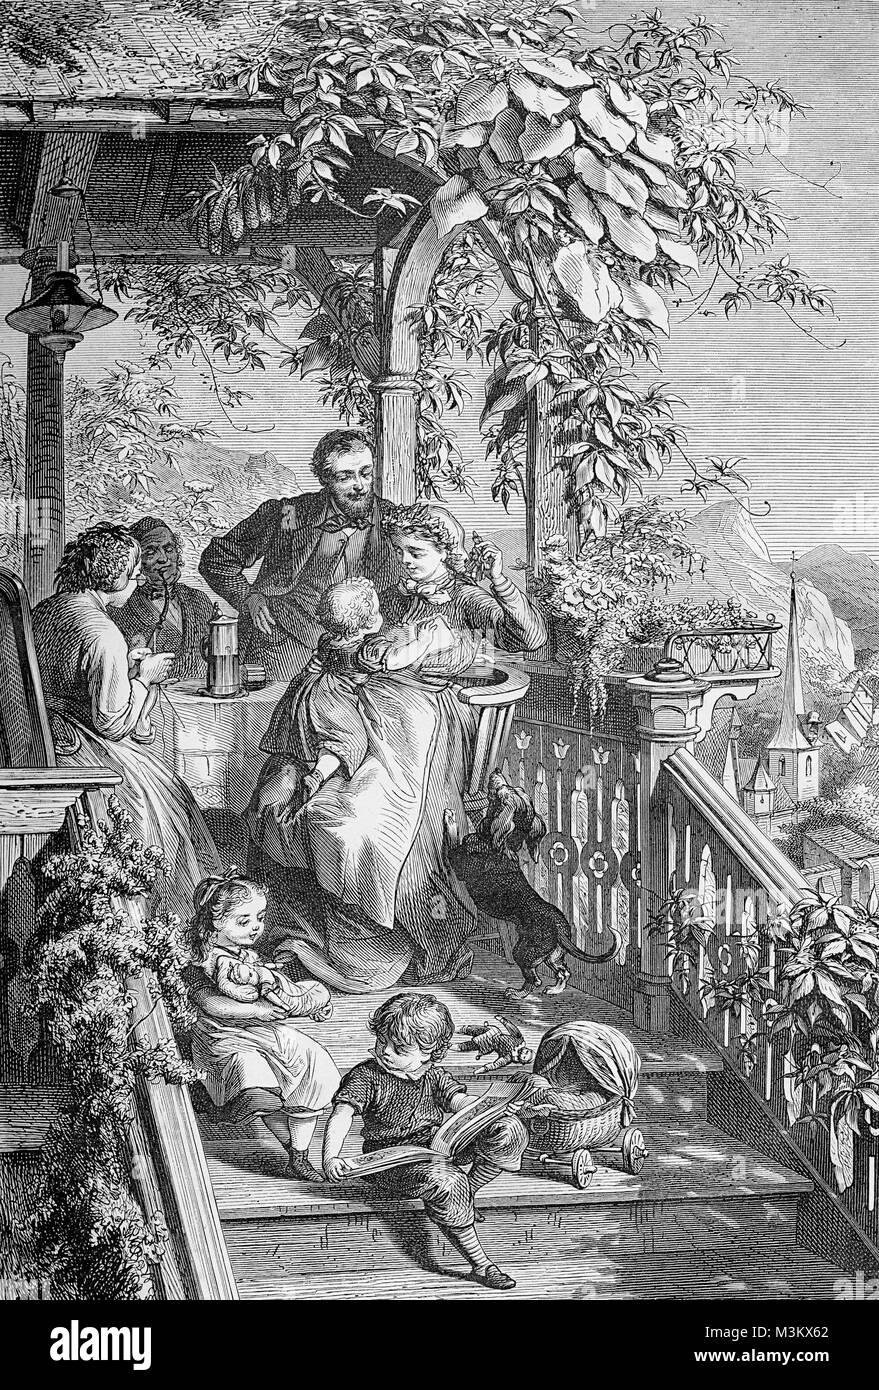 Cheerful family  enjoying springtime in veranda, vintage engraving - Stock Image